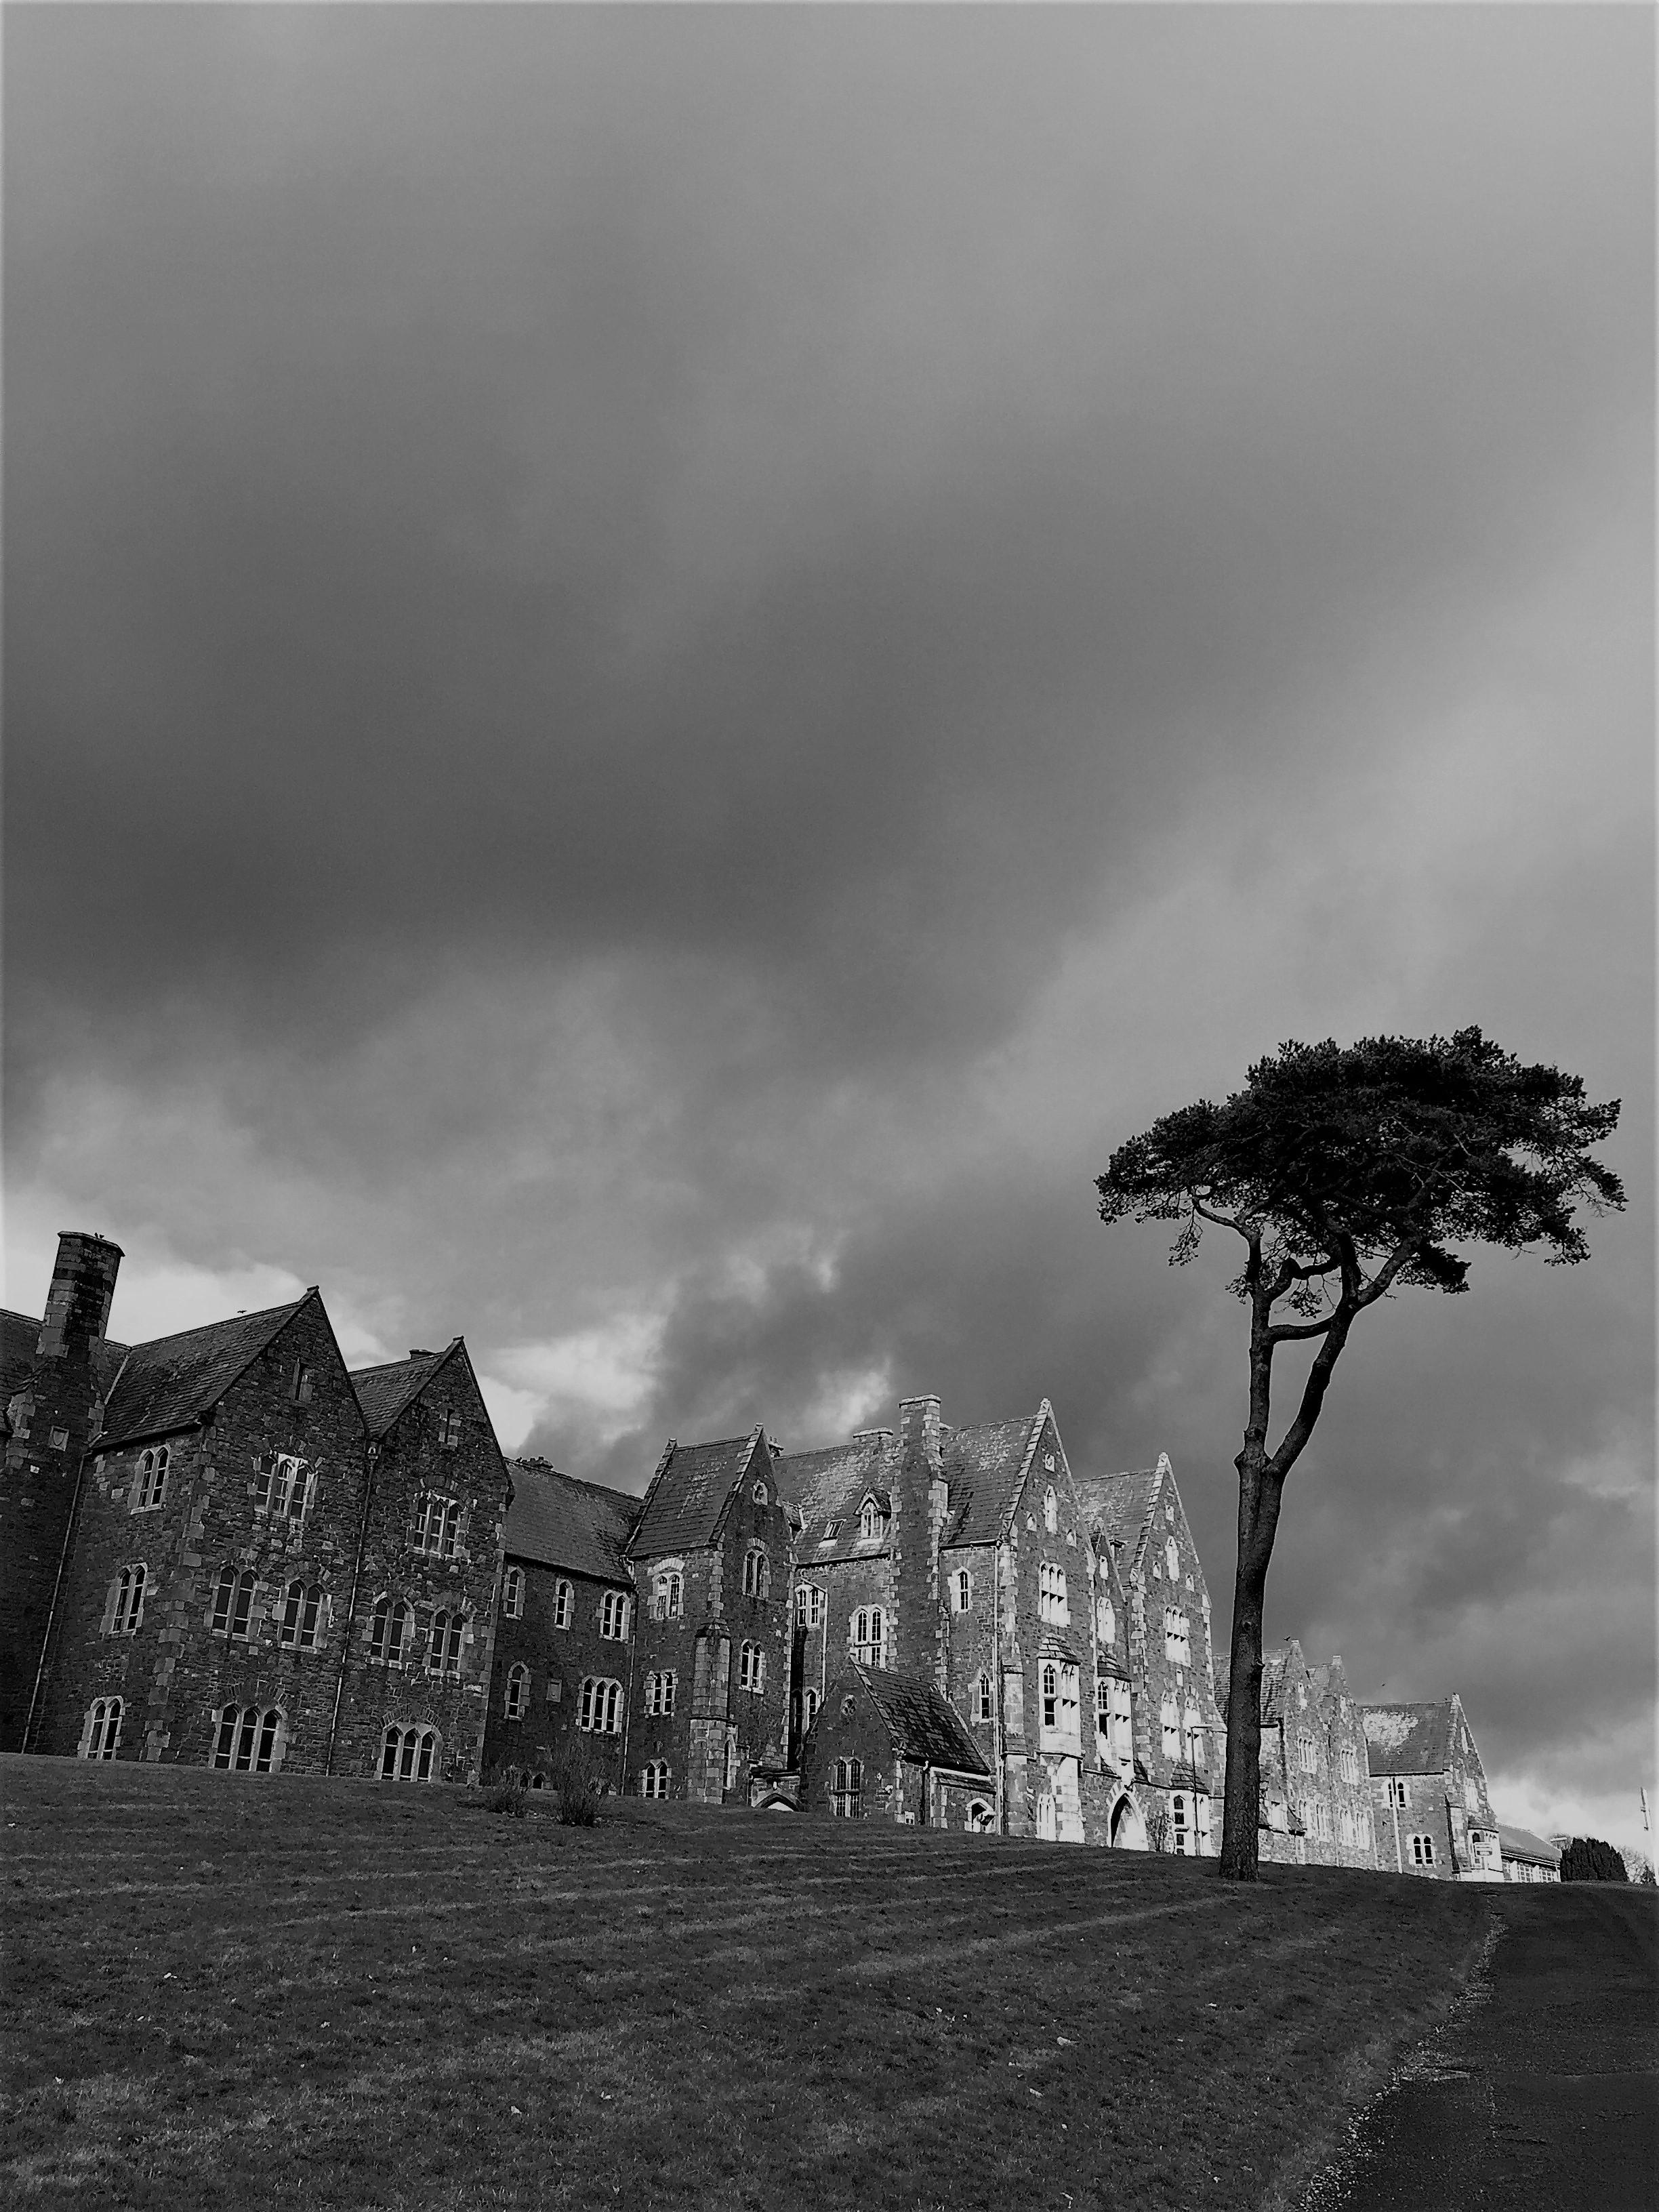 1-St Finan's Hospital  on the hilltop overlooking Killarney town